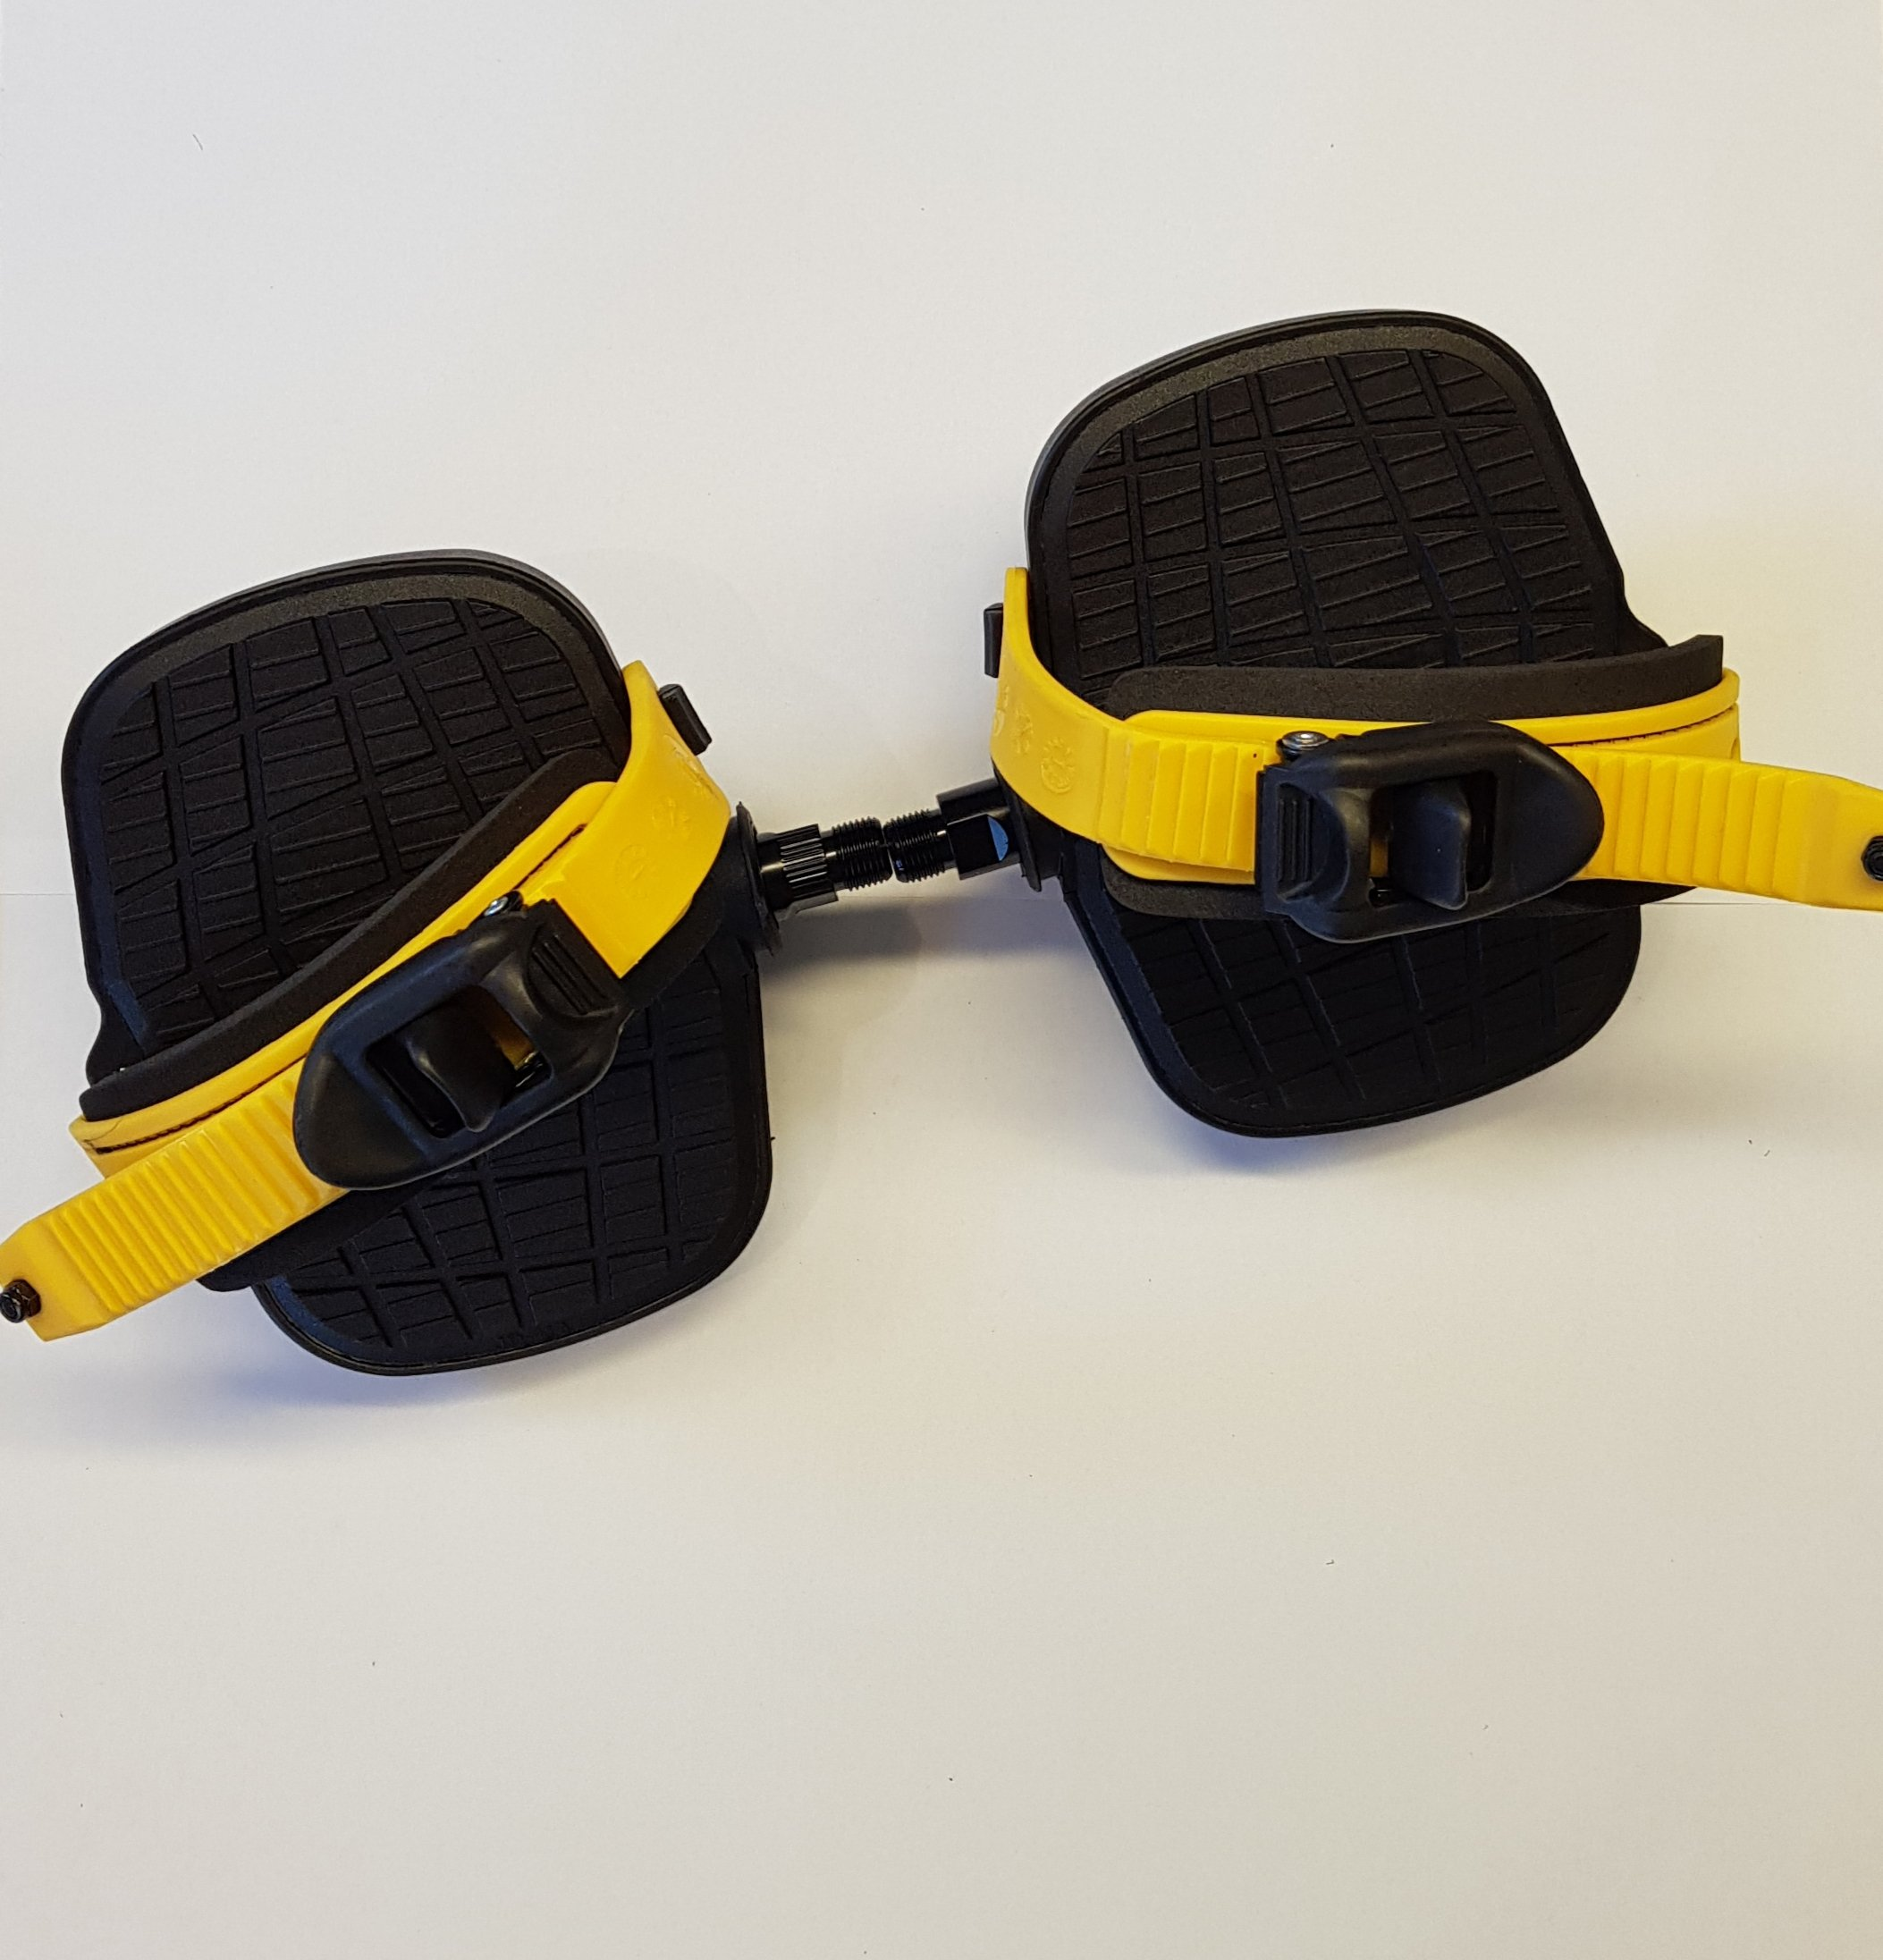 250G Liegefahrrad Pedal Paar (Gelb)